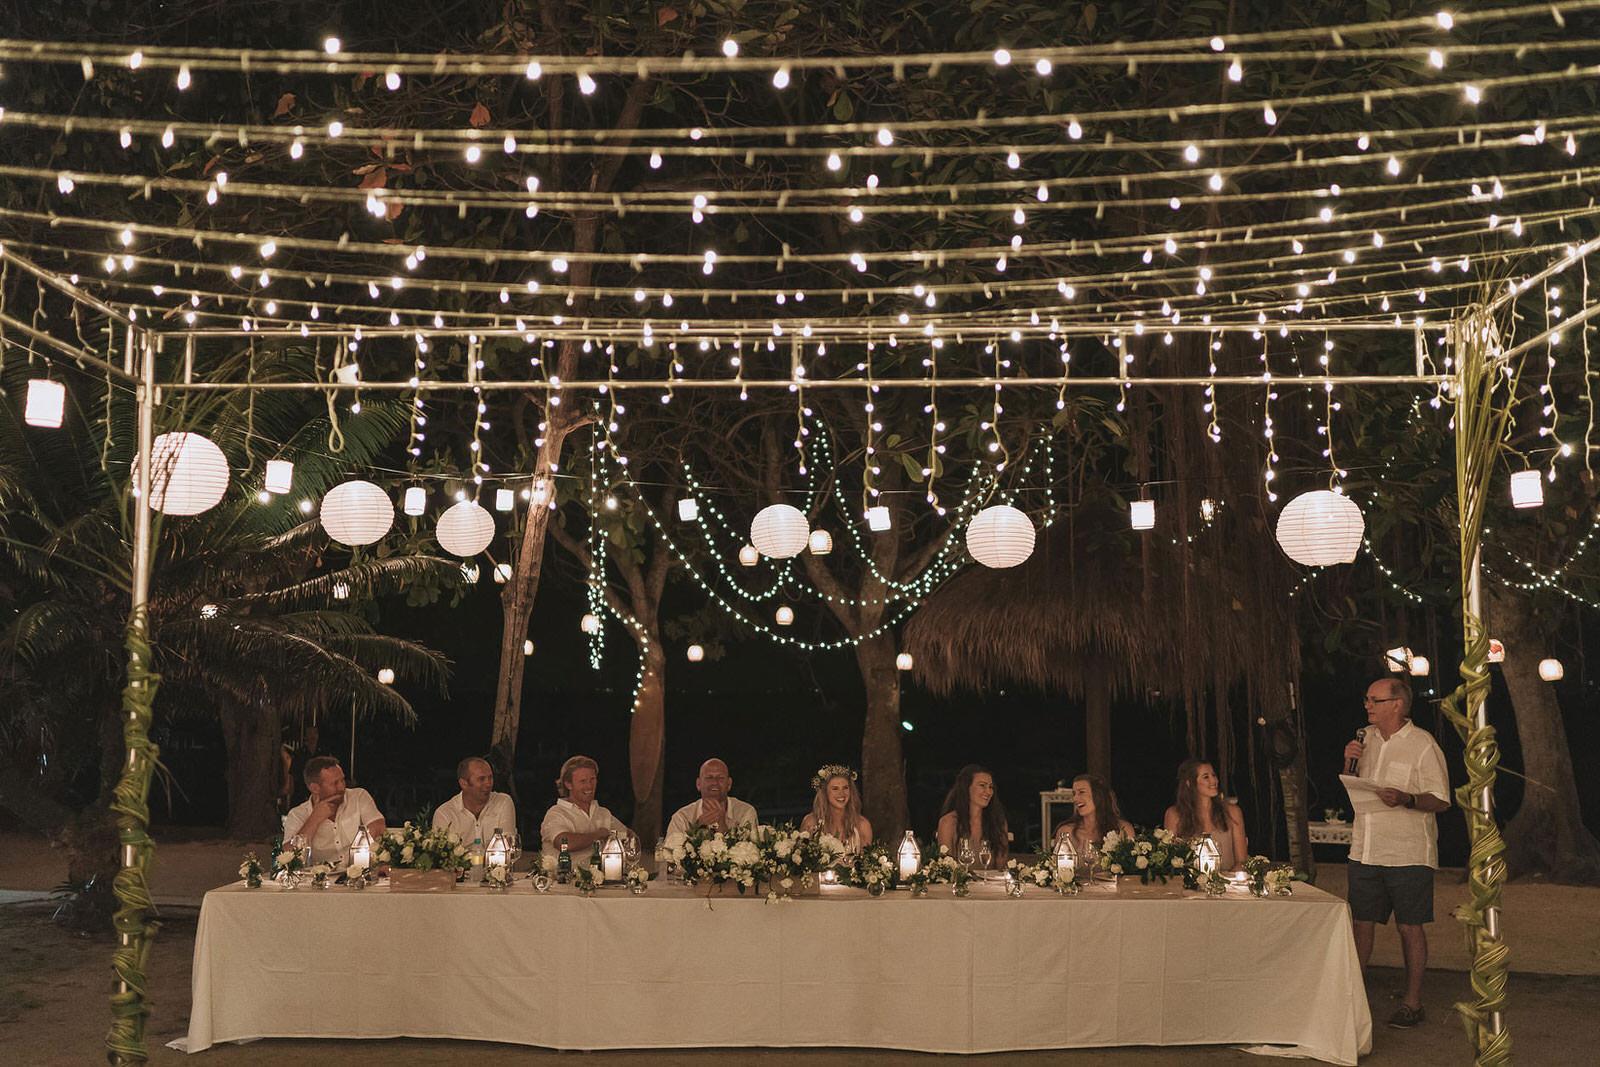 newfound-hai-tide-nusa-lembongan-bali-wedding-photographers-151